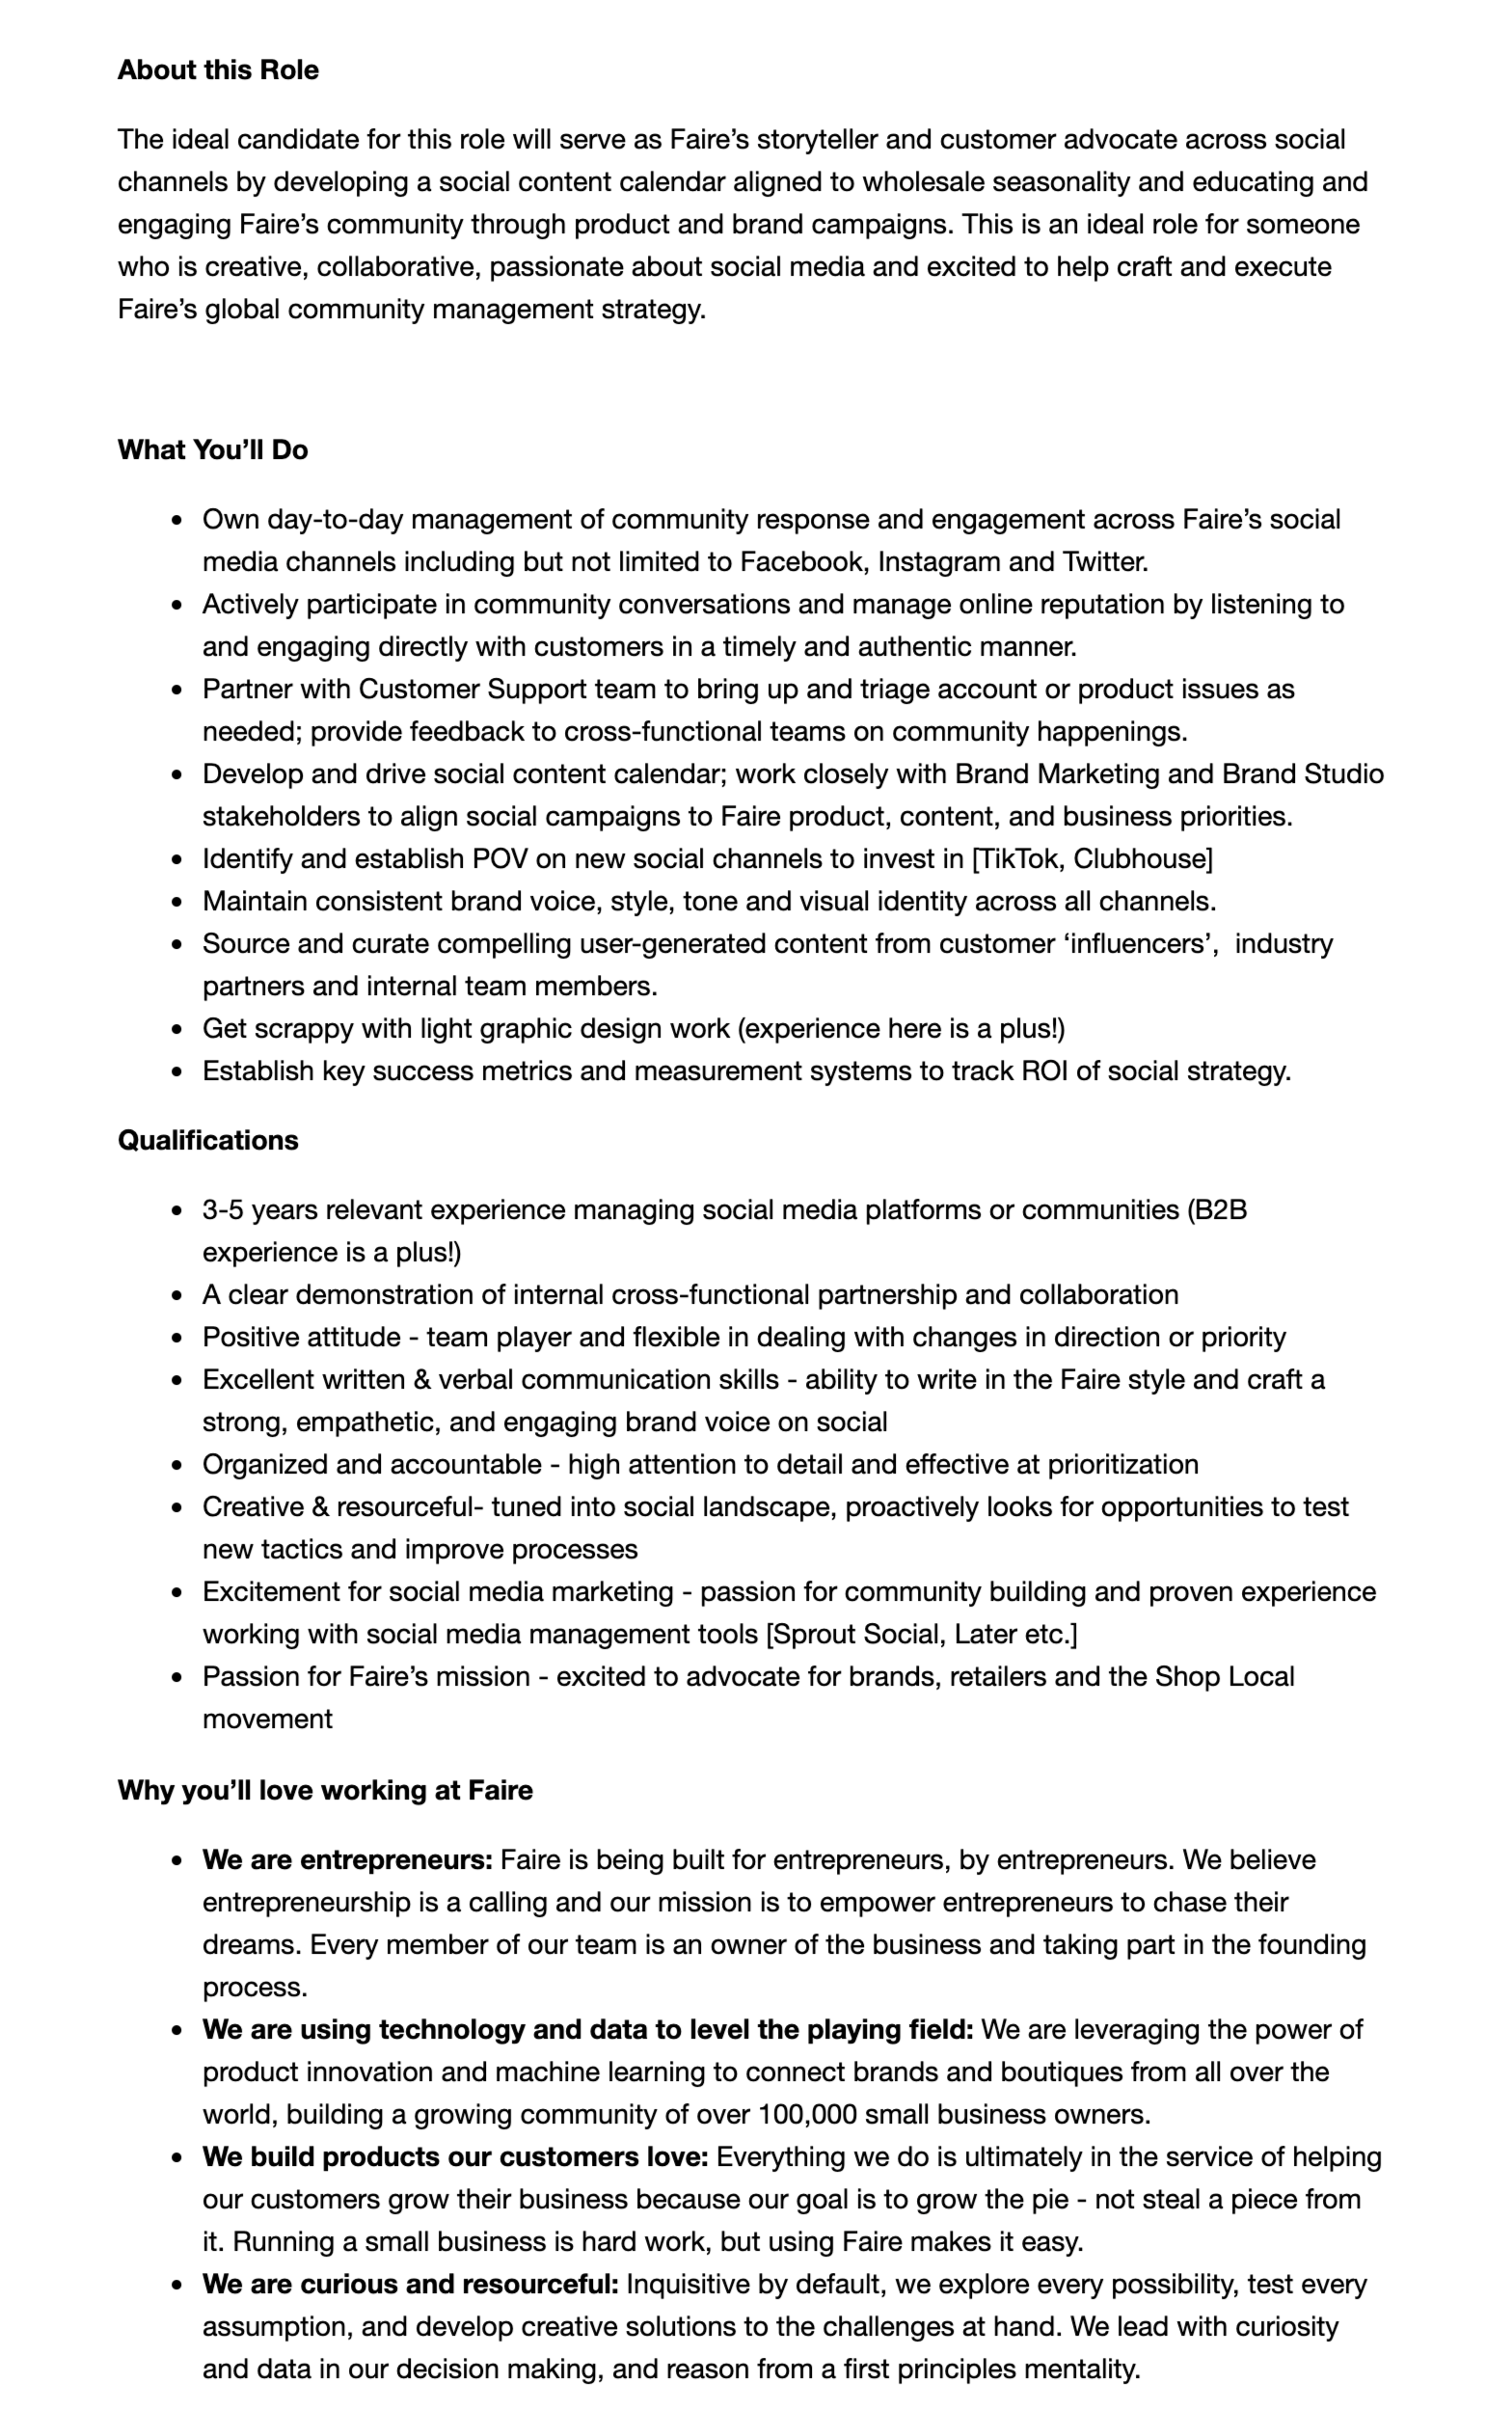 sample job description social media coordinator-faire